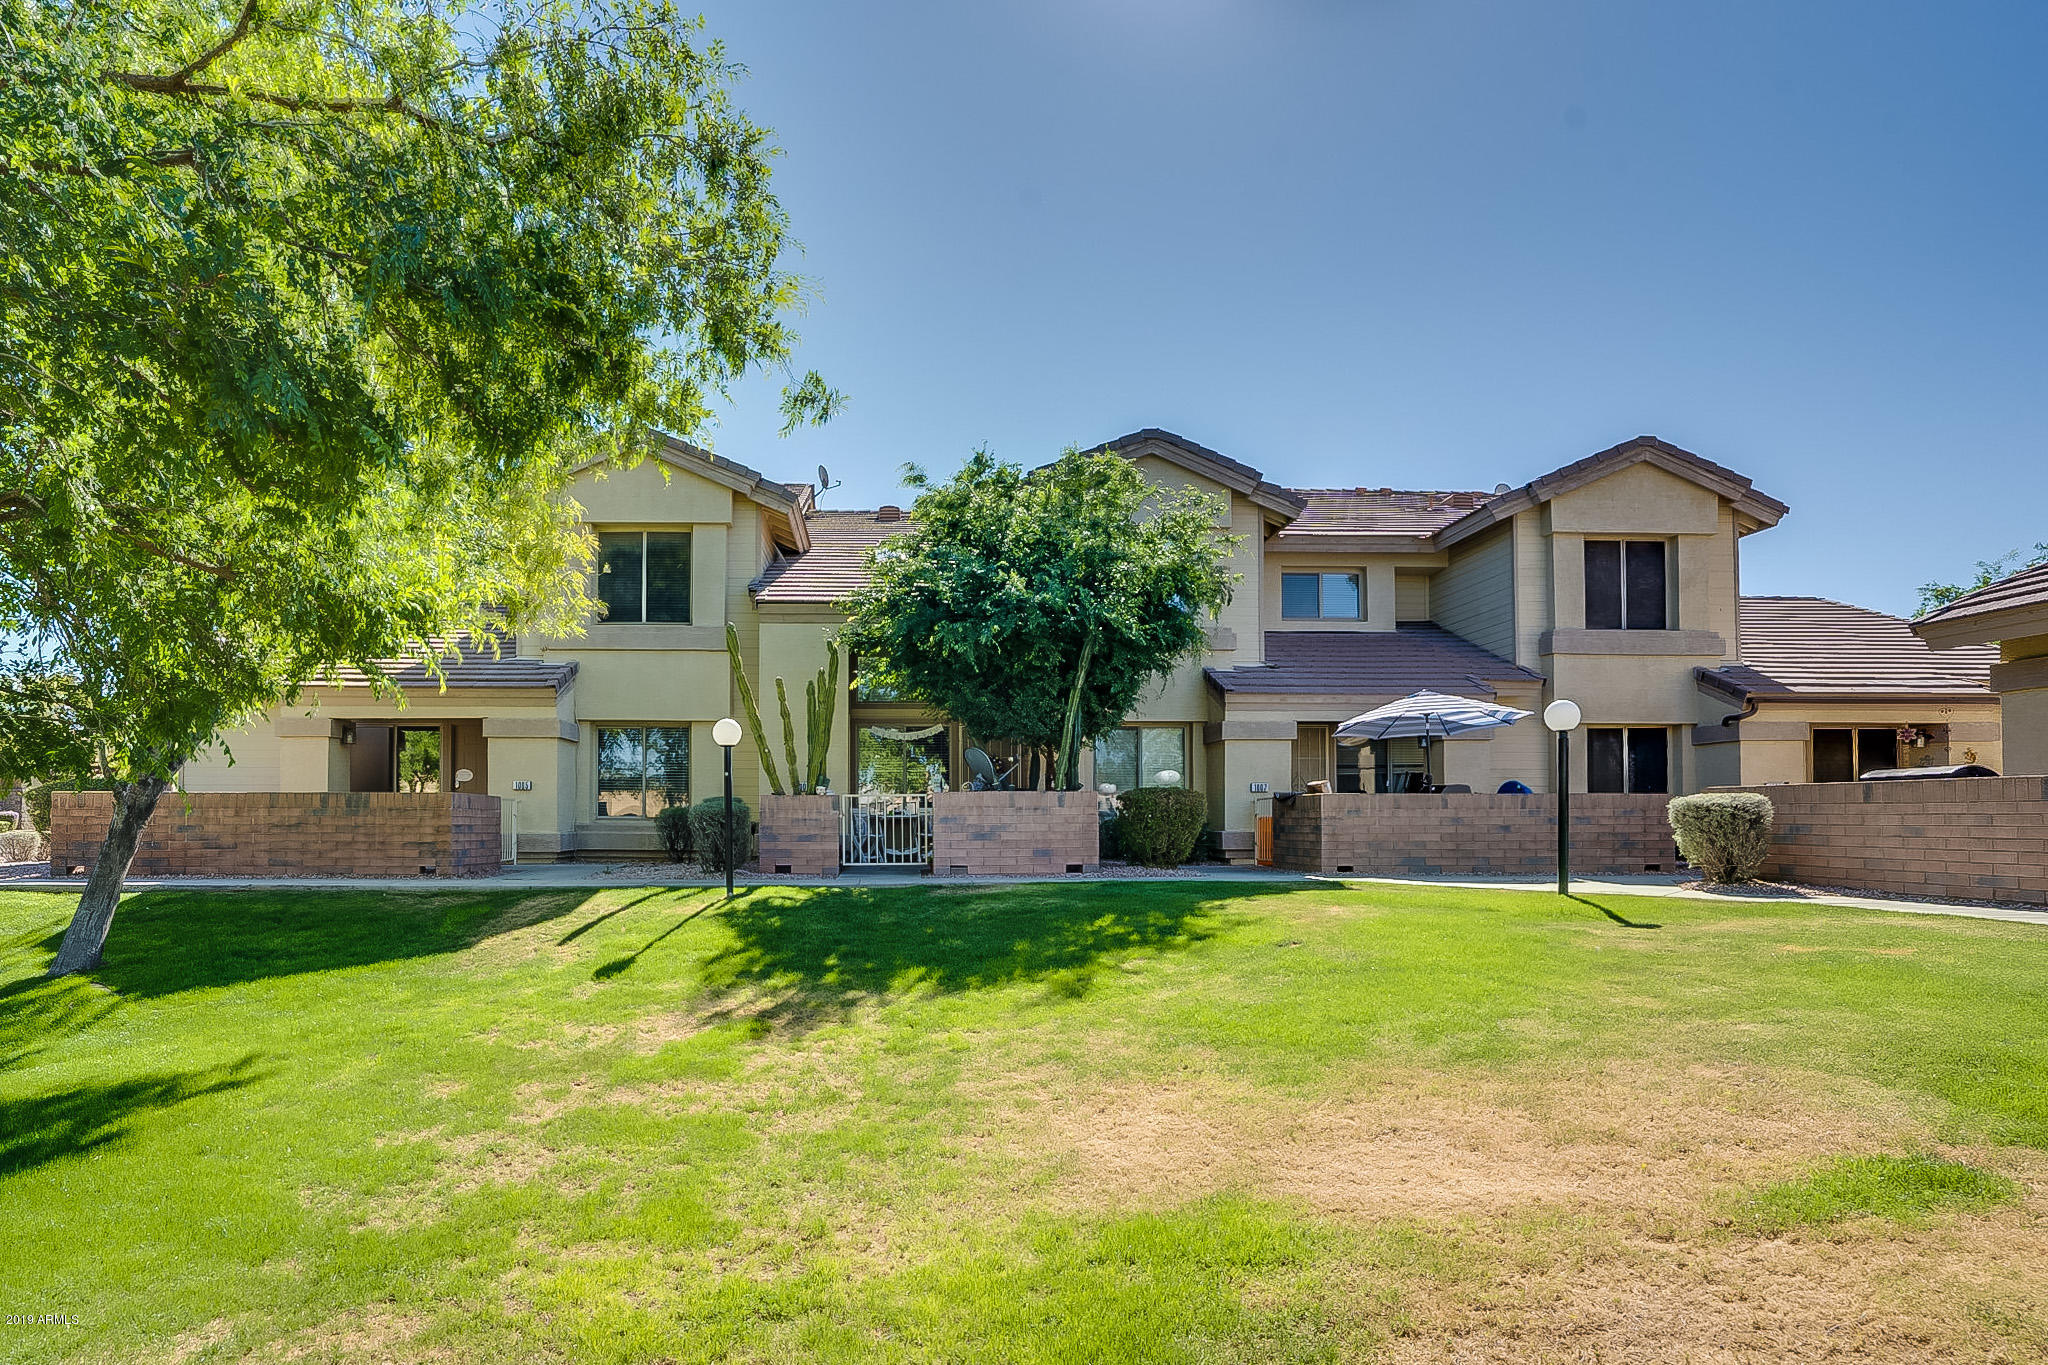 Photo of 2201 N COMANCHE Drive #1005, Chandler, AZ 85224